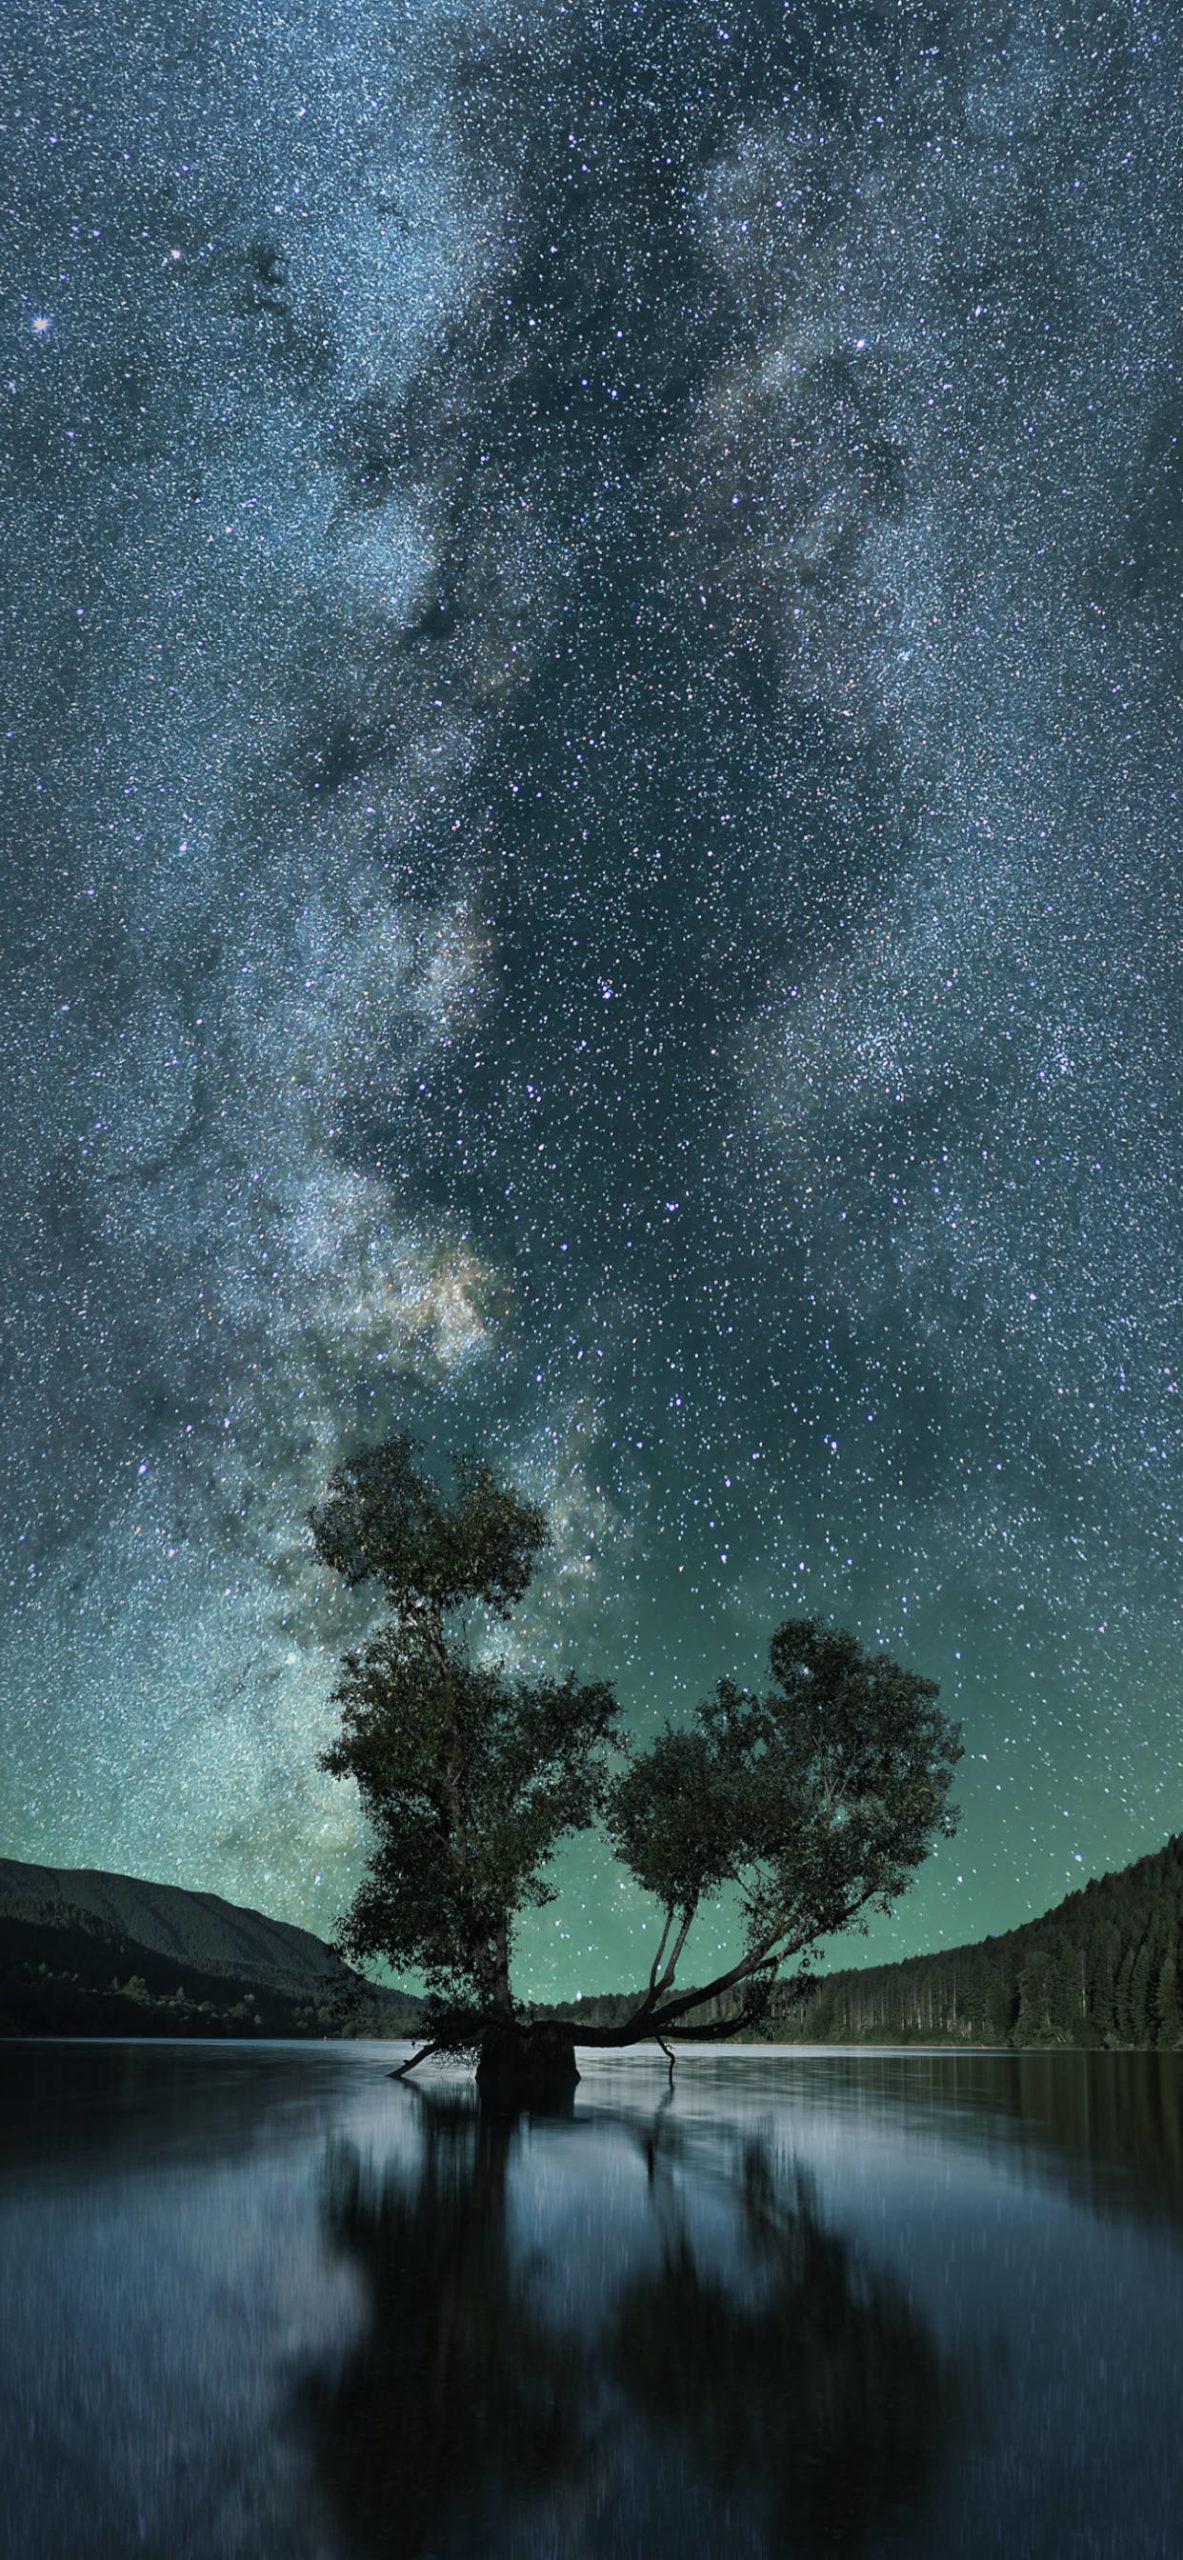 iPhone wallpapers stars ratllesnake lake scaled Stars